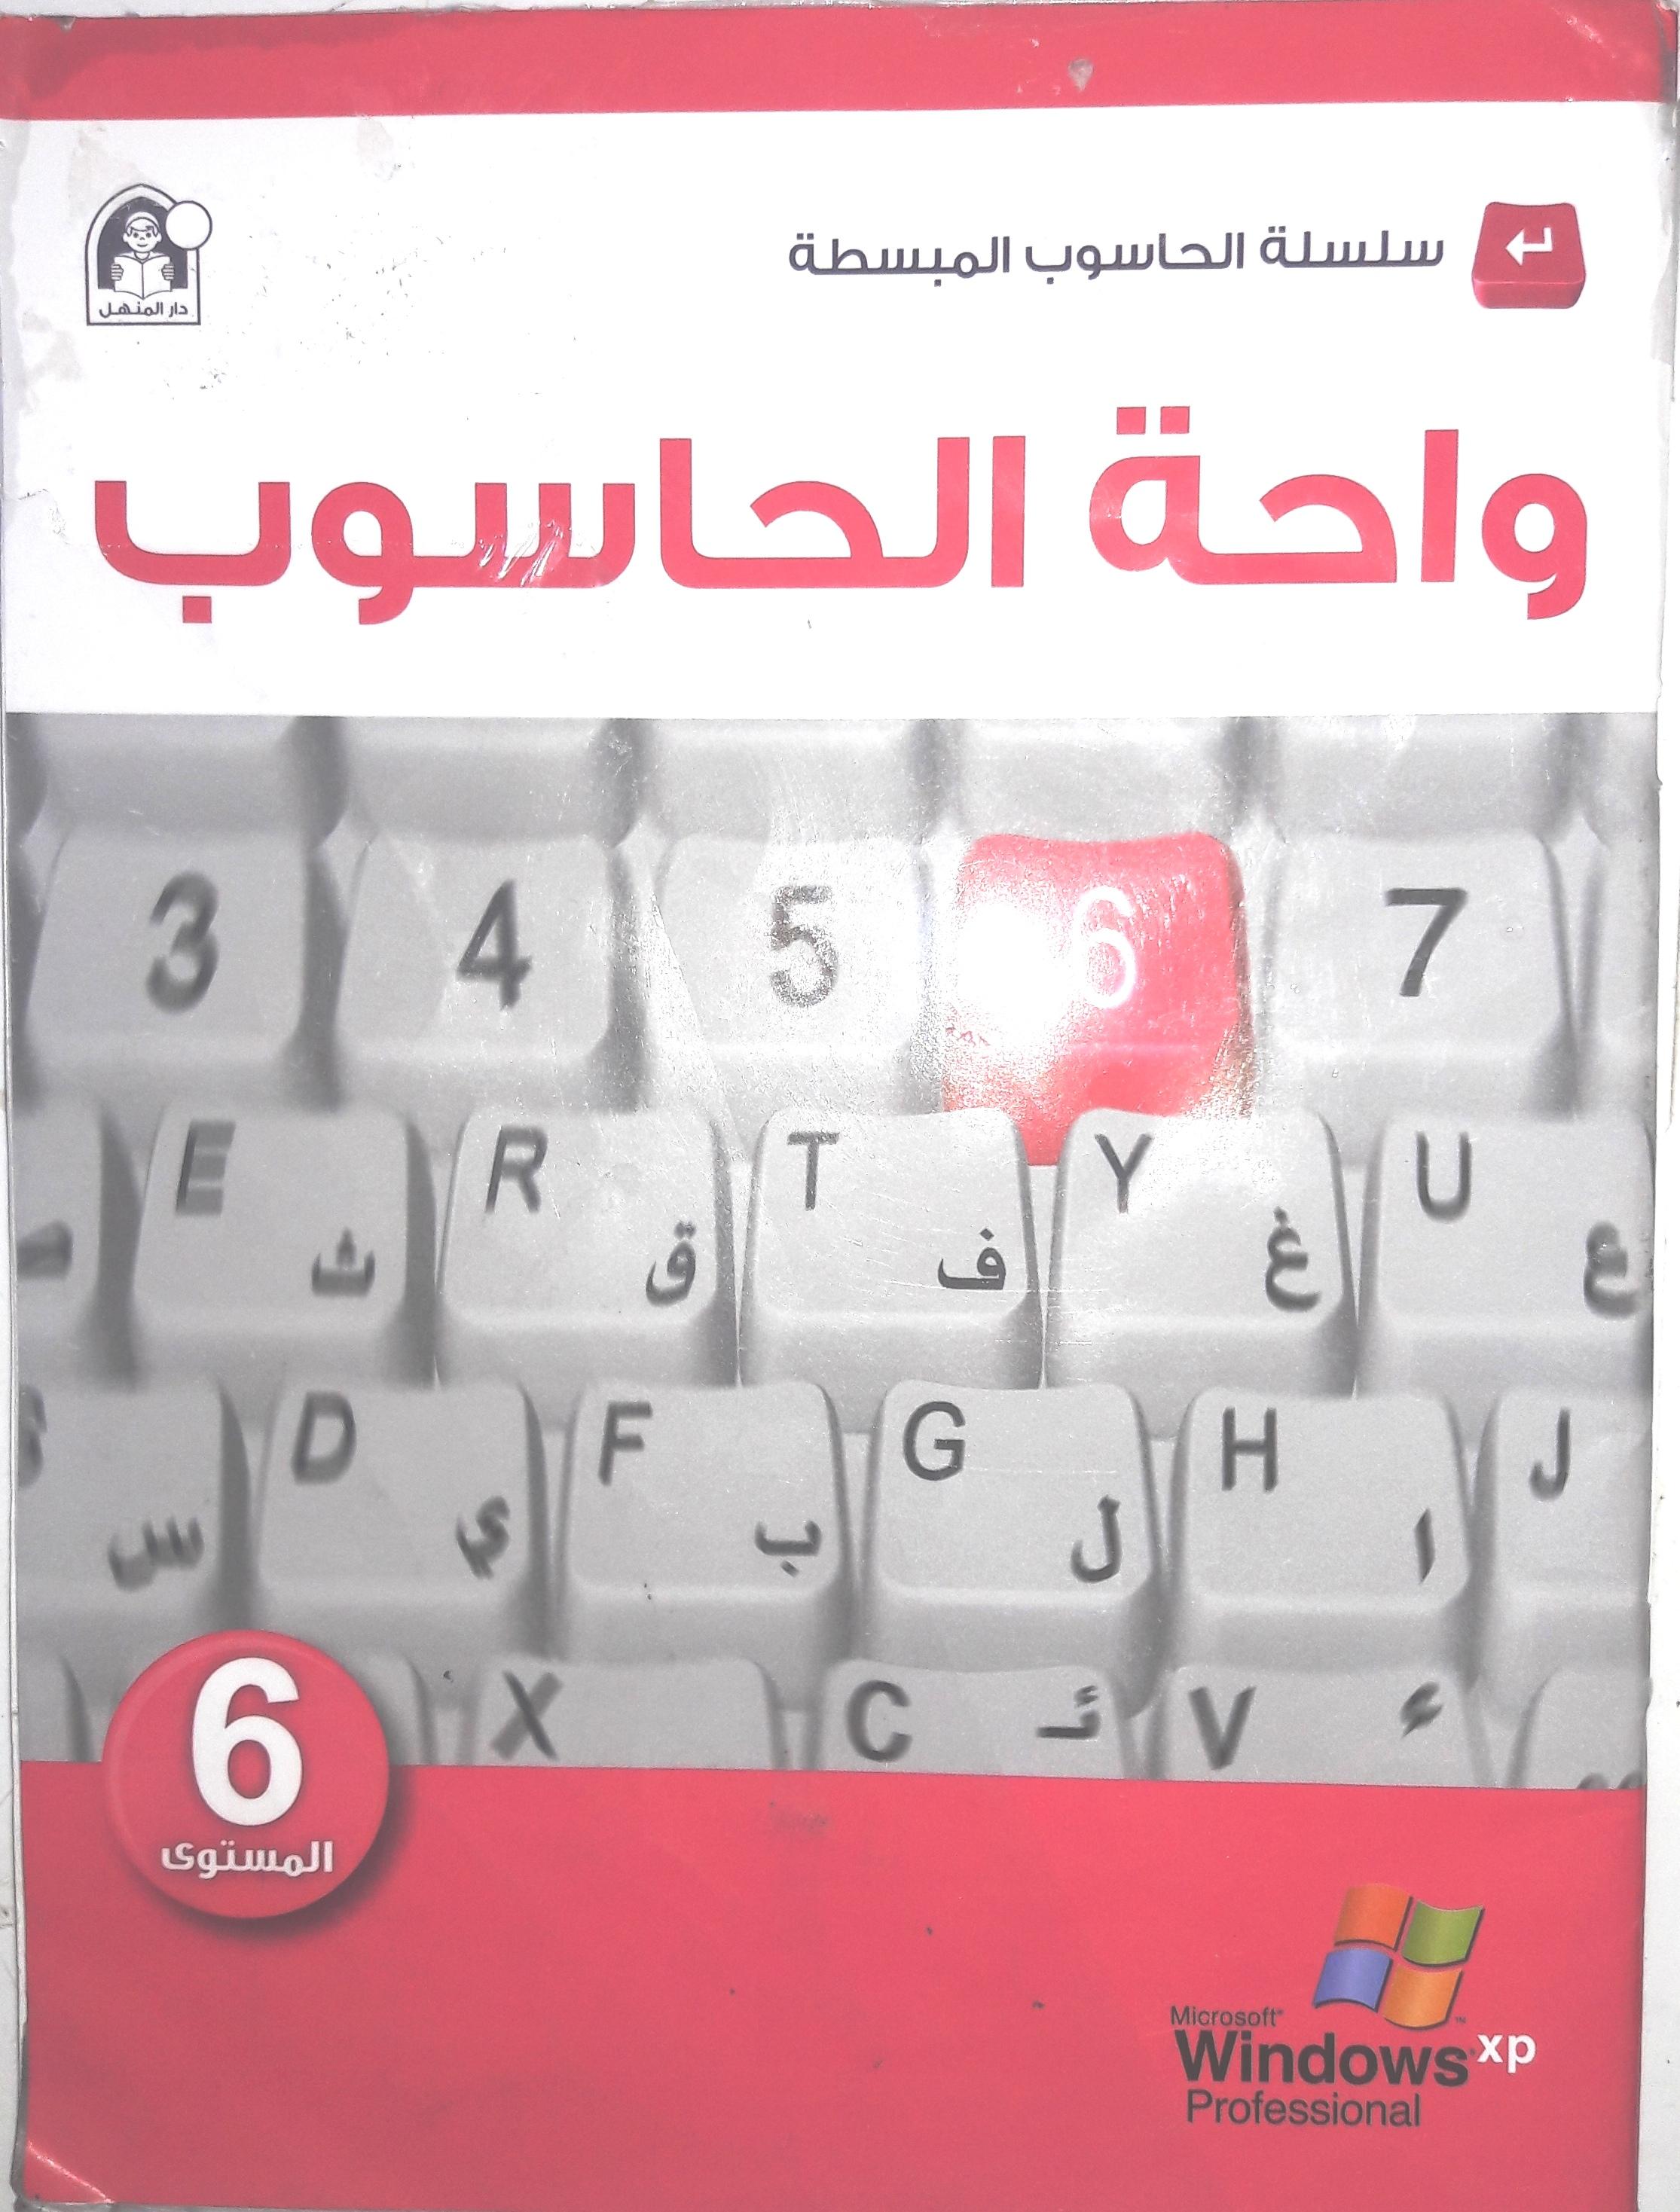 الحاسوب do.php?img=48505